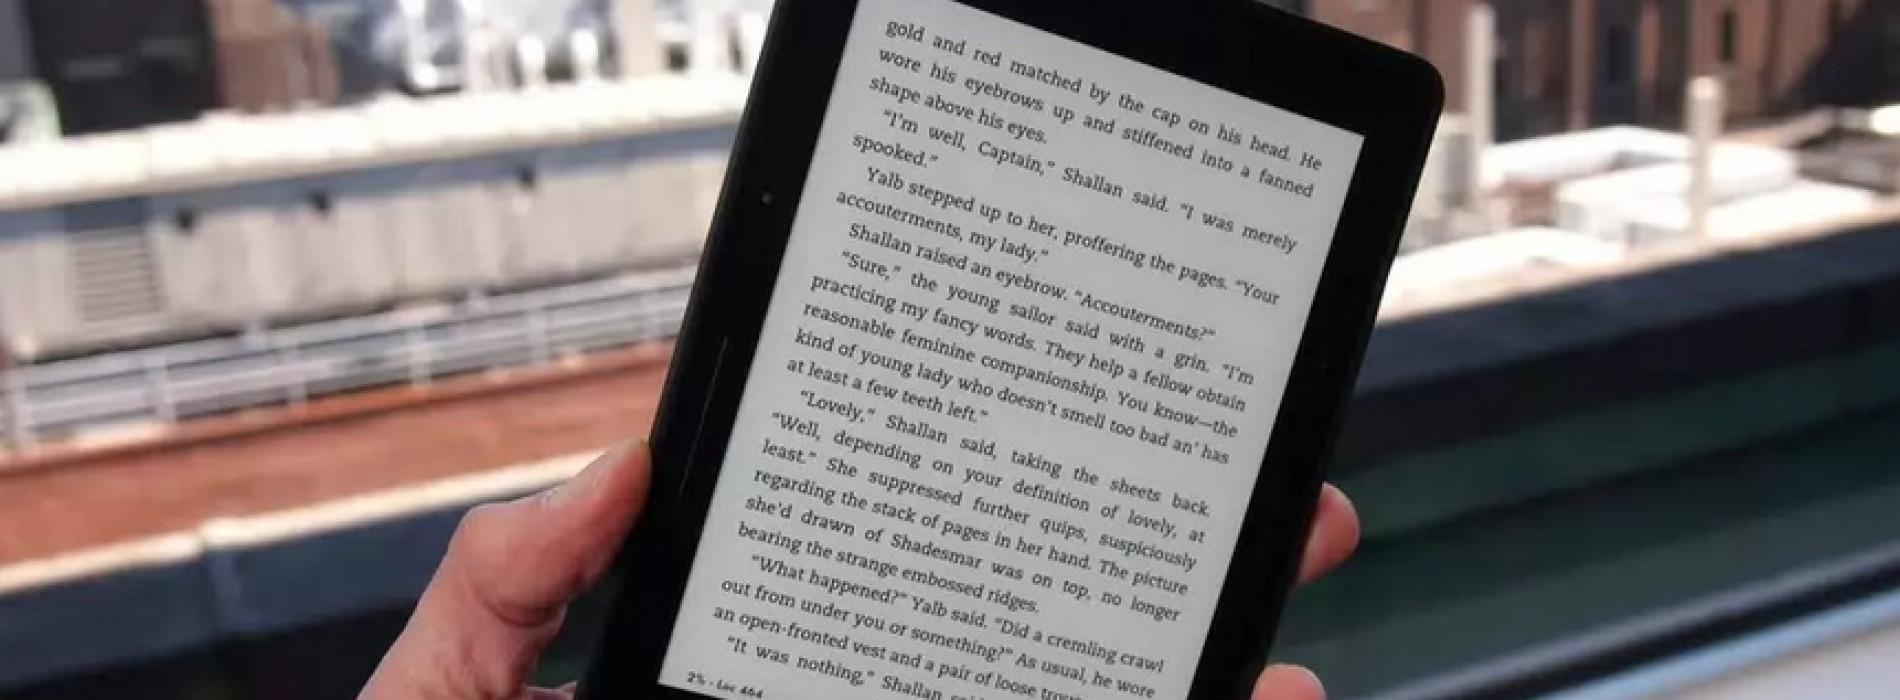 Amazon Kindle Voyage aneb Paperwhite 3 se letos nekoná